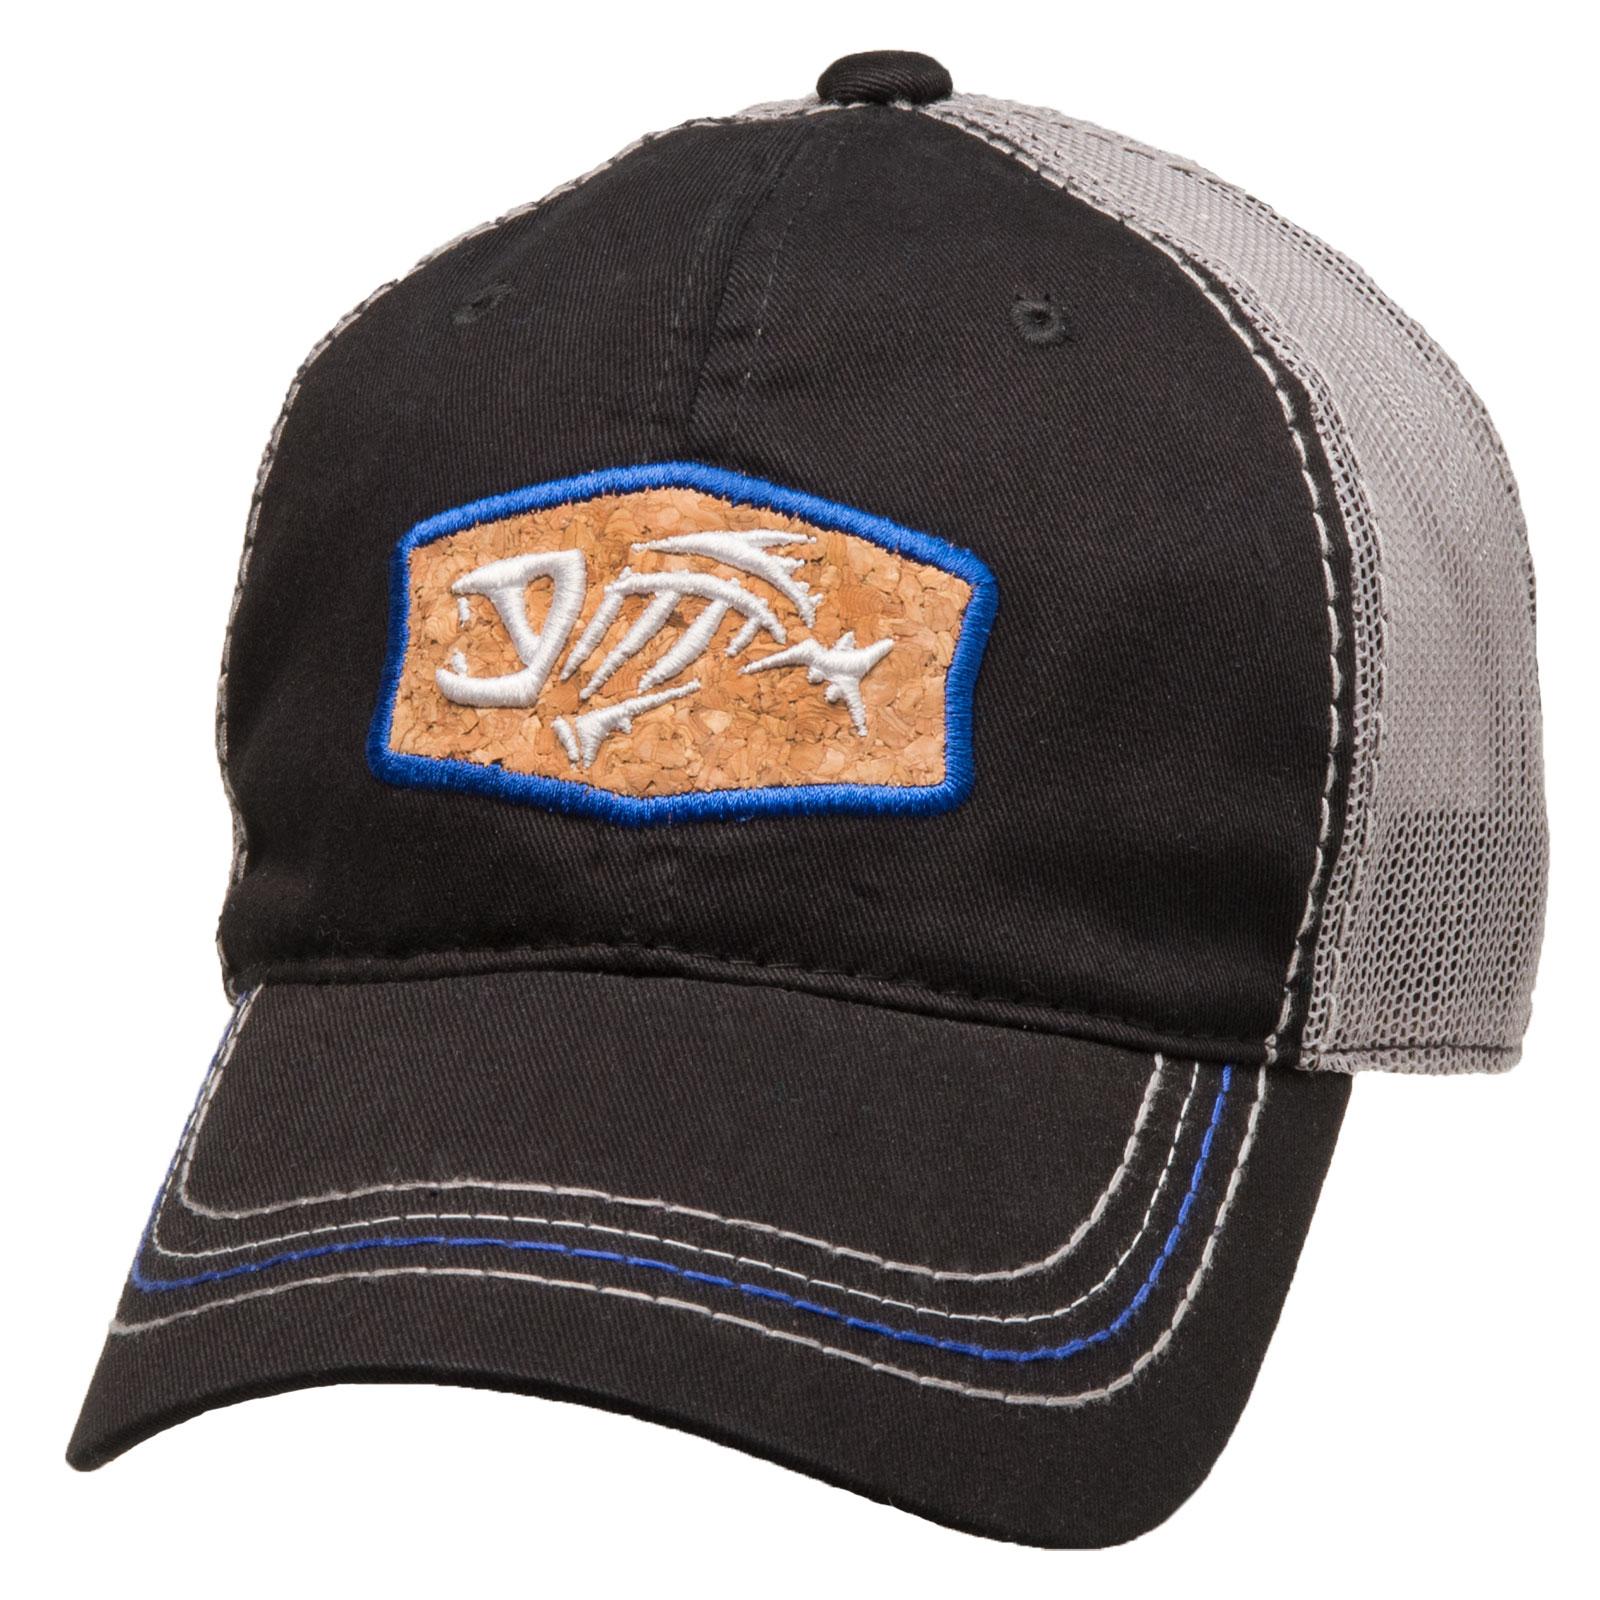 G Loomis Skeleton Fish Logo Cork Trucker Cotton Cap One